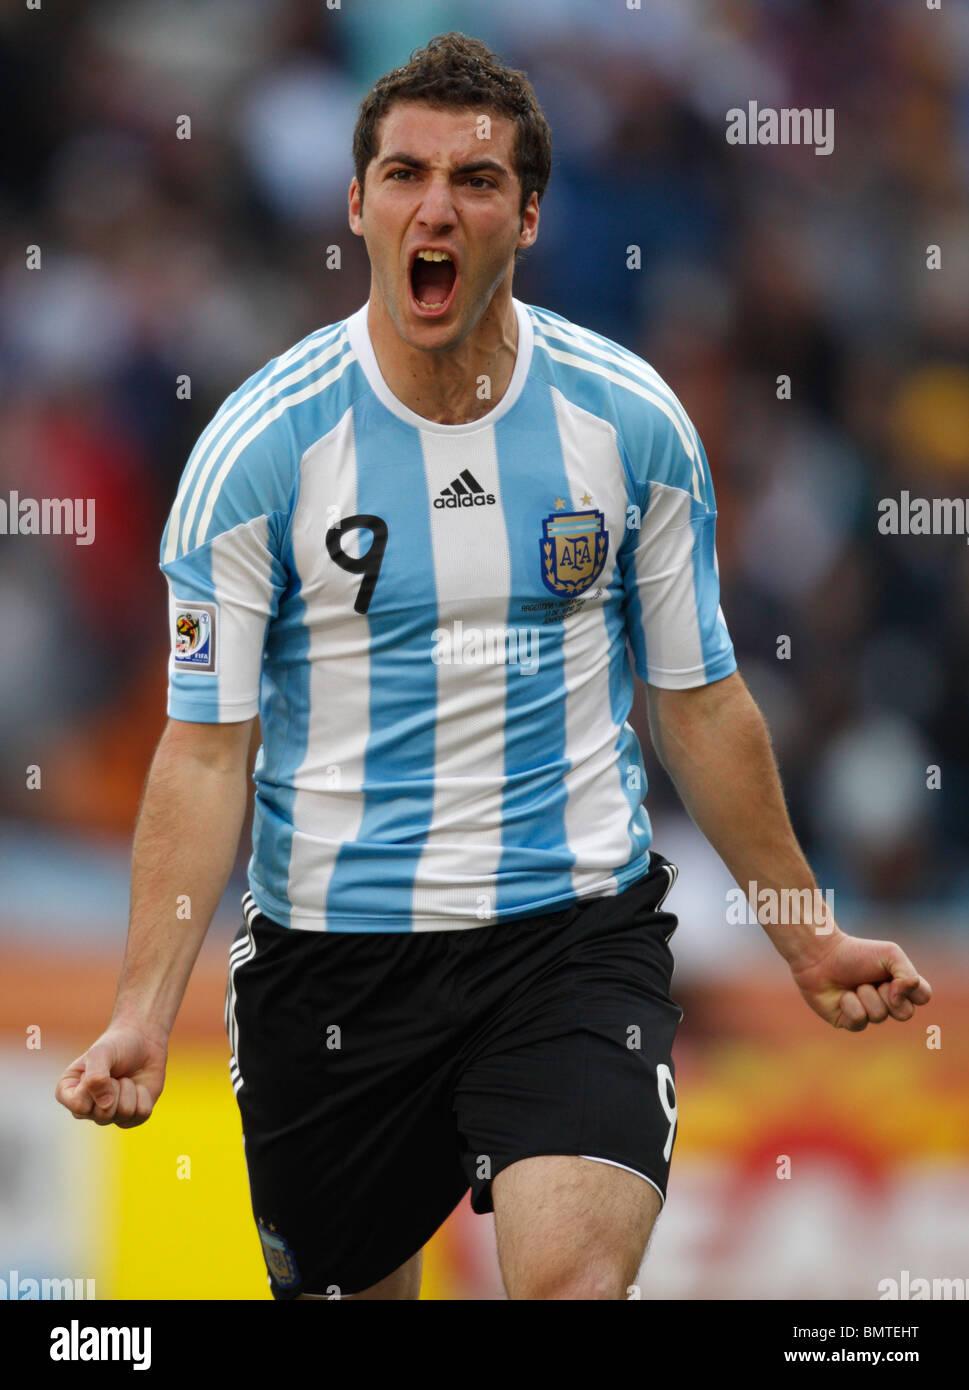 Gonzalo Higuain of Argentina celebrates after scoring a goal